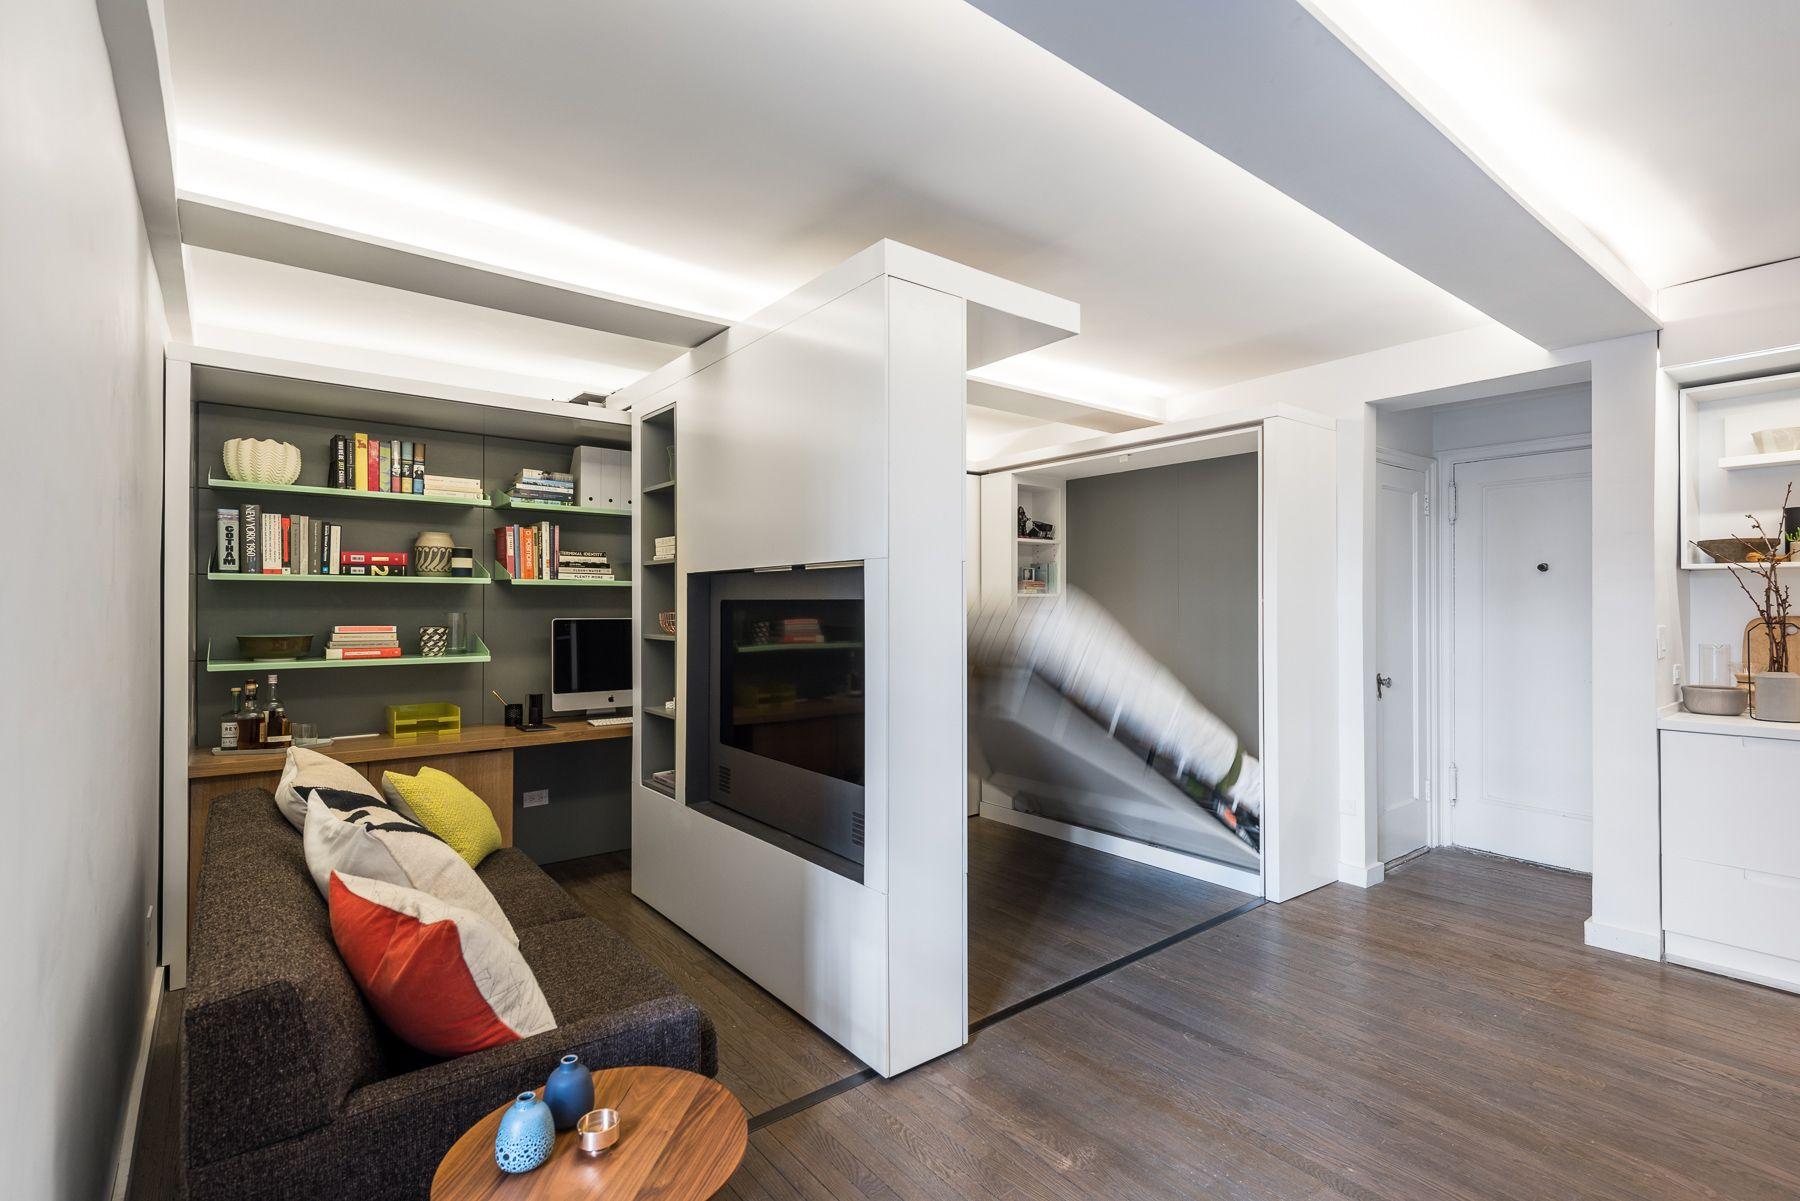 5to1-Micro-Apartment-NY_15 | Studio Apartment | Pinterest | Flats ...